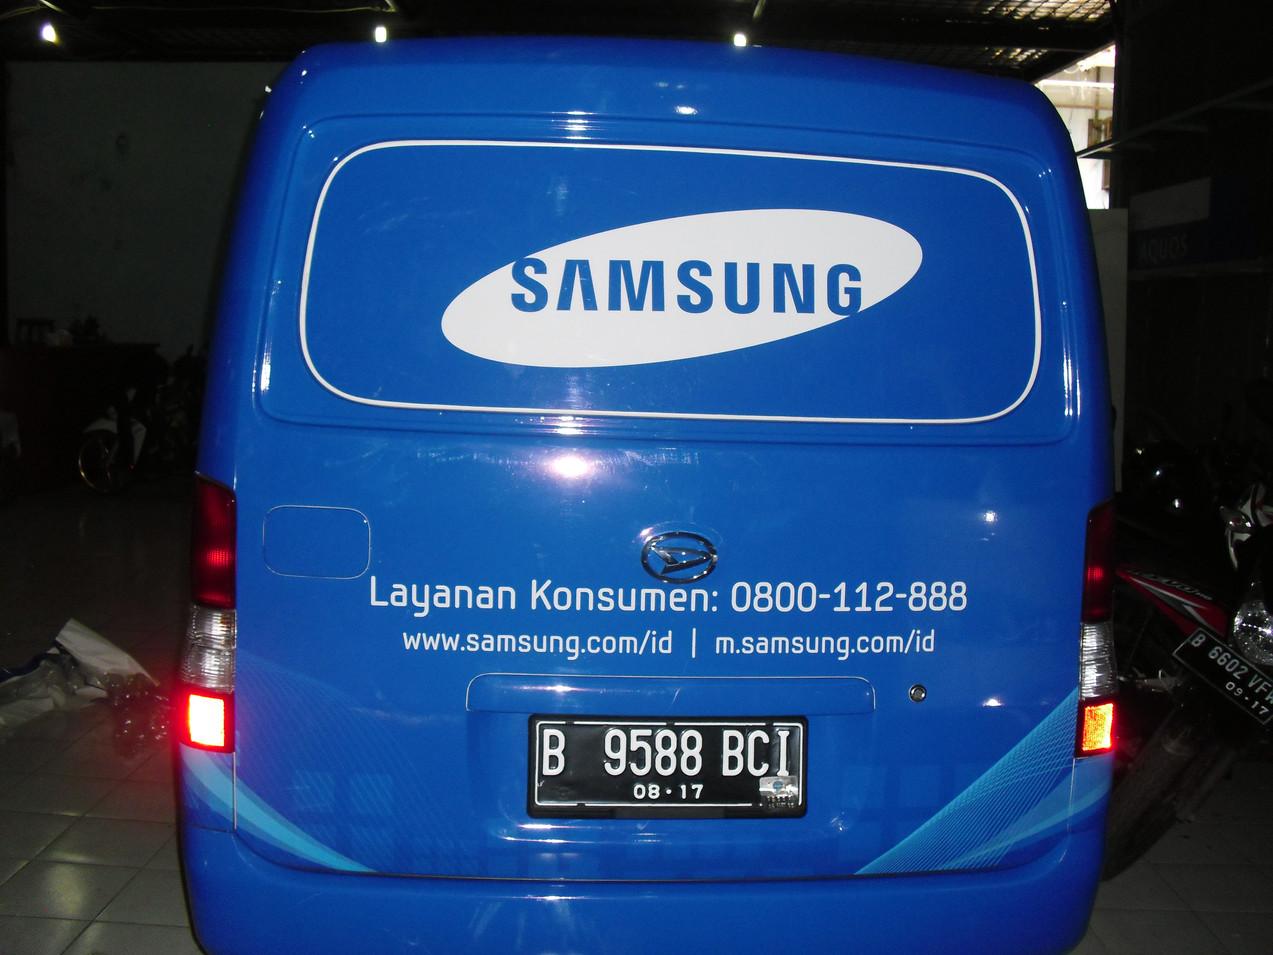 Car Branding - Samsung by Quickprint